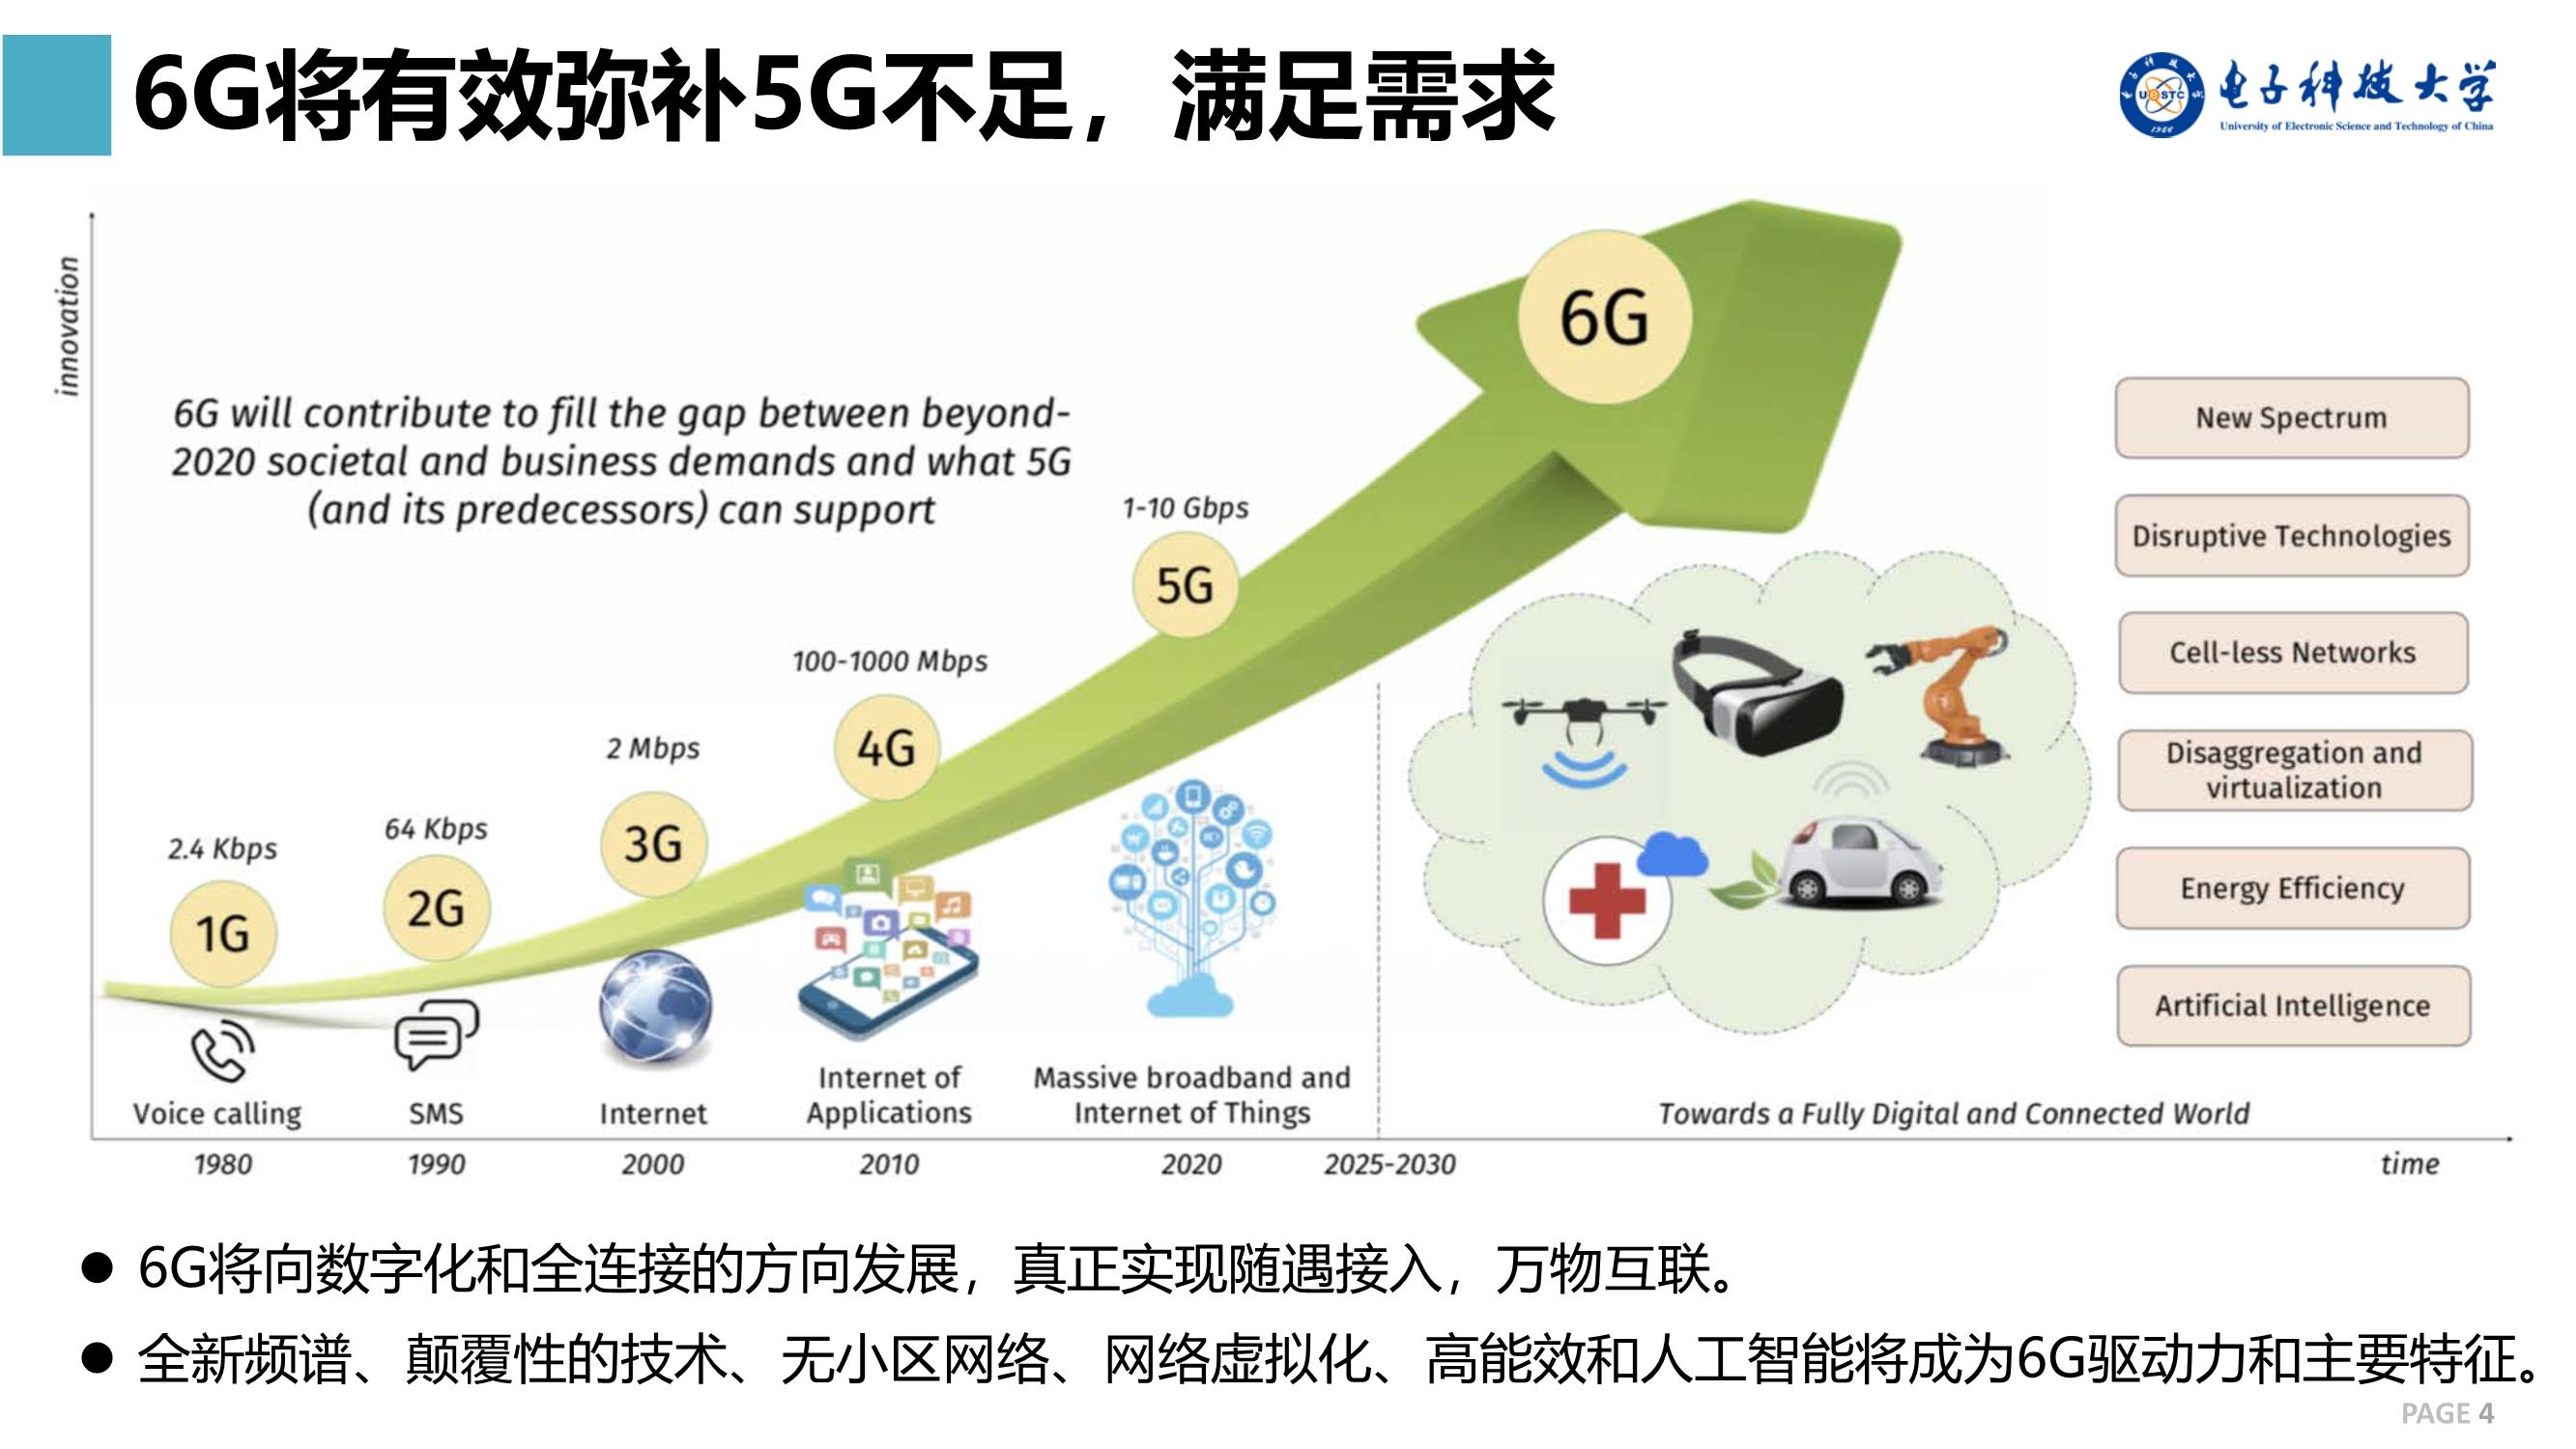 5G不足,6G来补:6G网络中的卫星通信